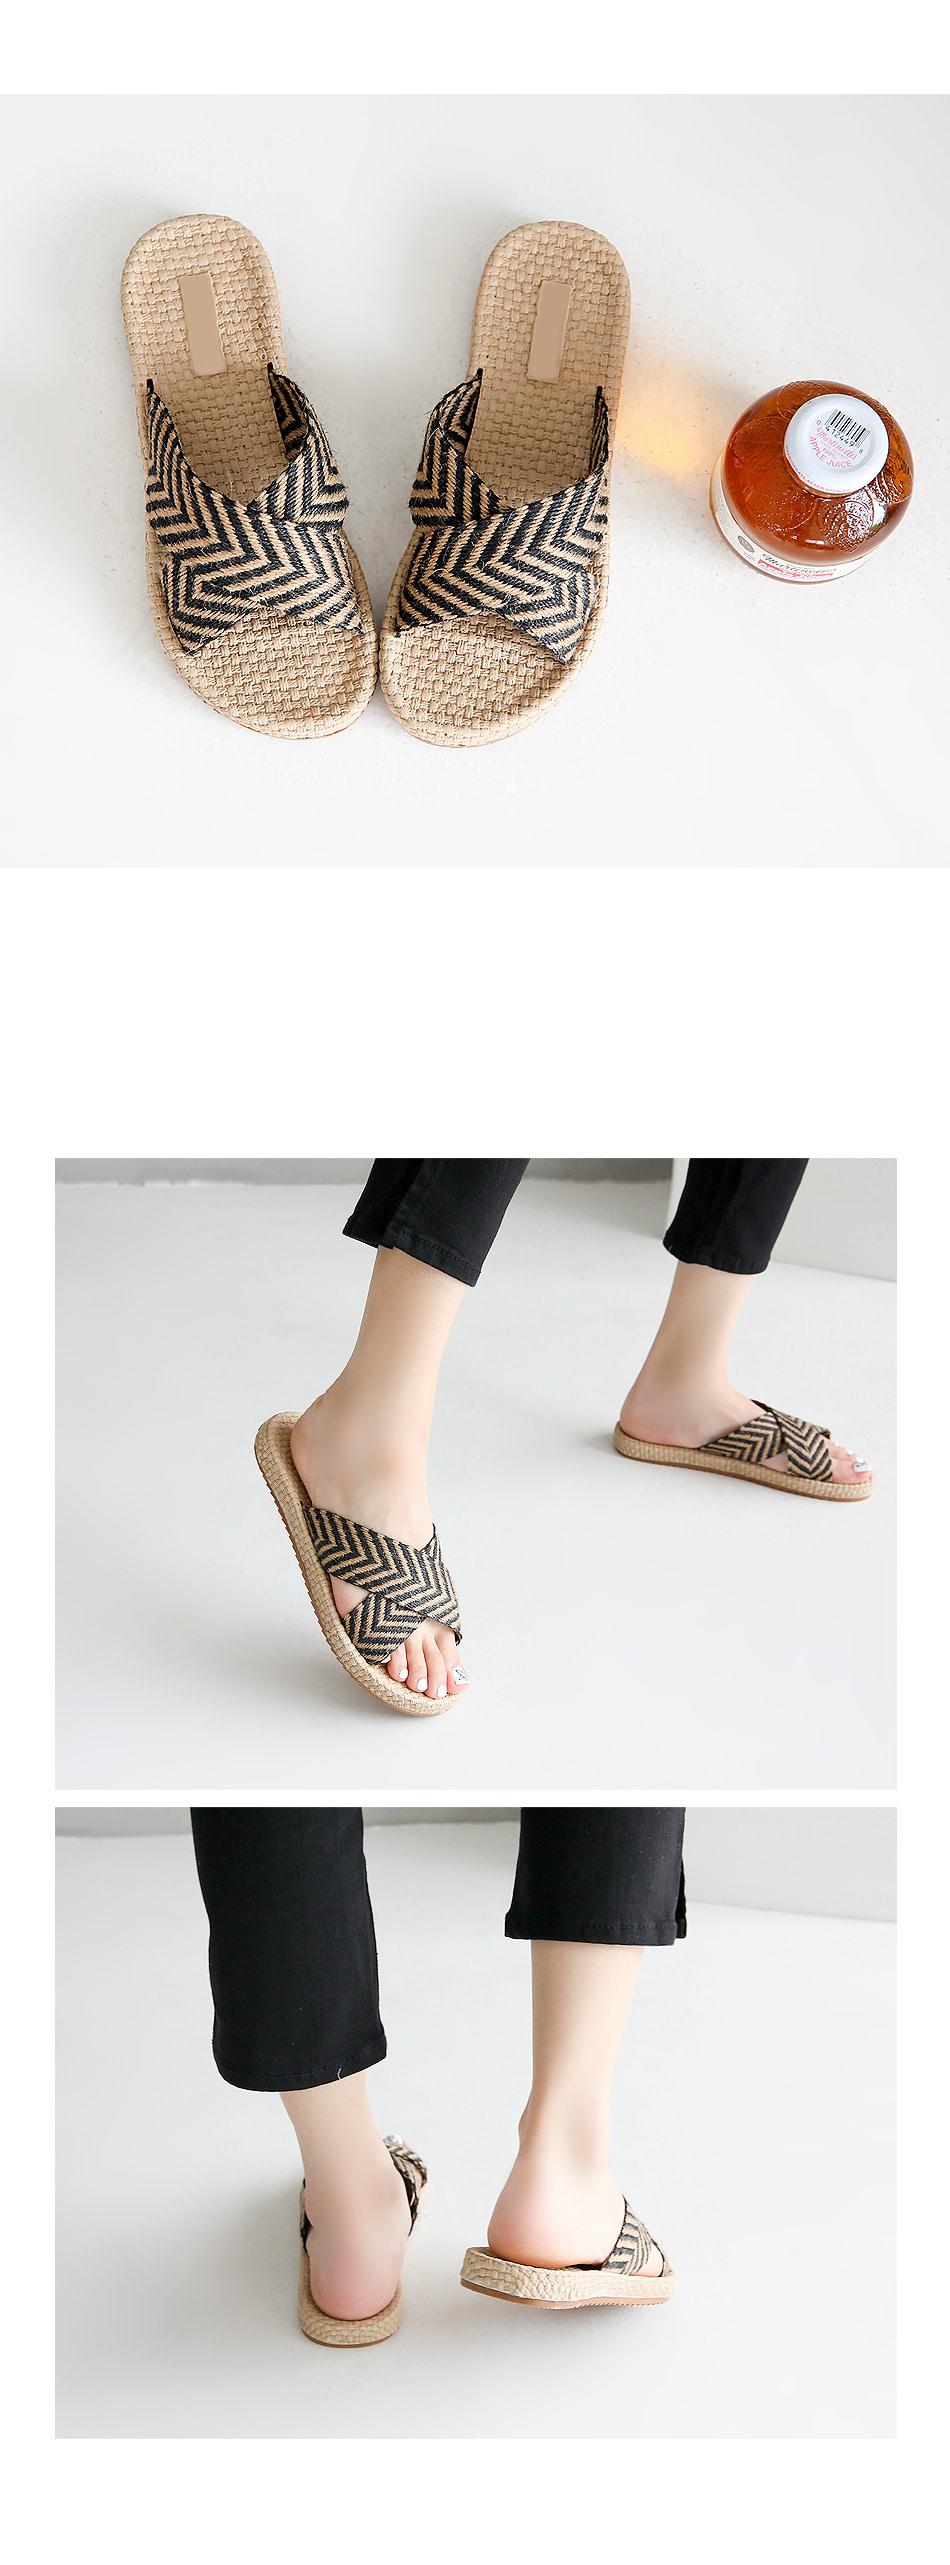 This Kellen Ratan Slippers 2cm